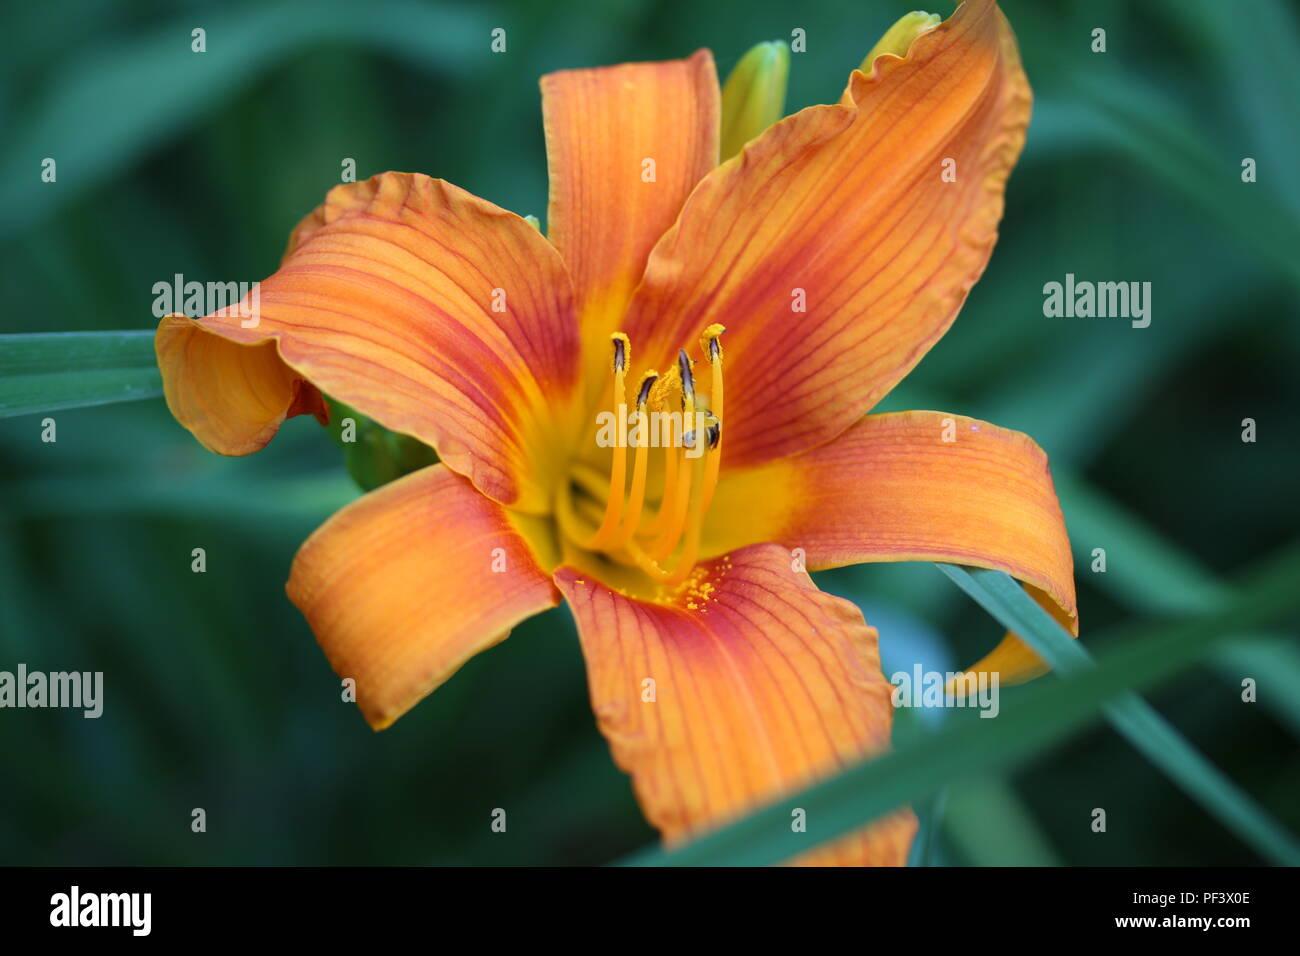 orange flower in a park - Stock Image